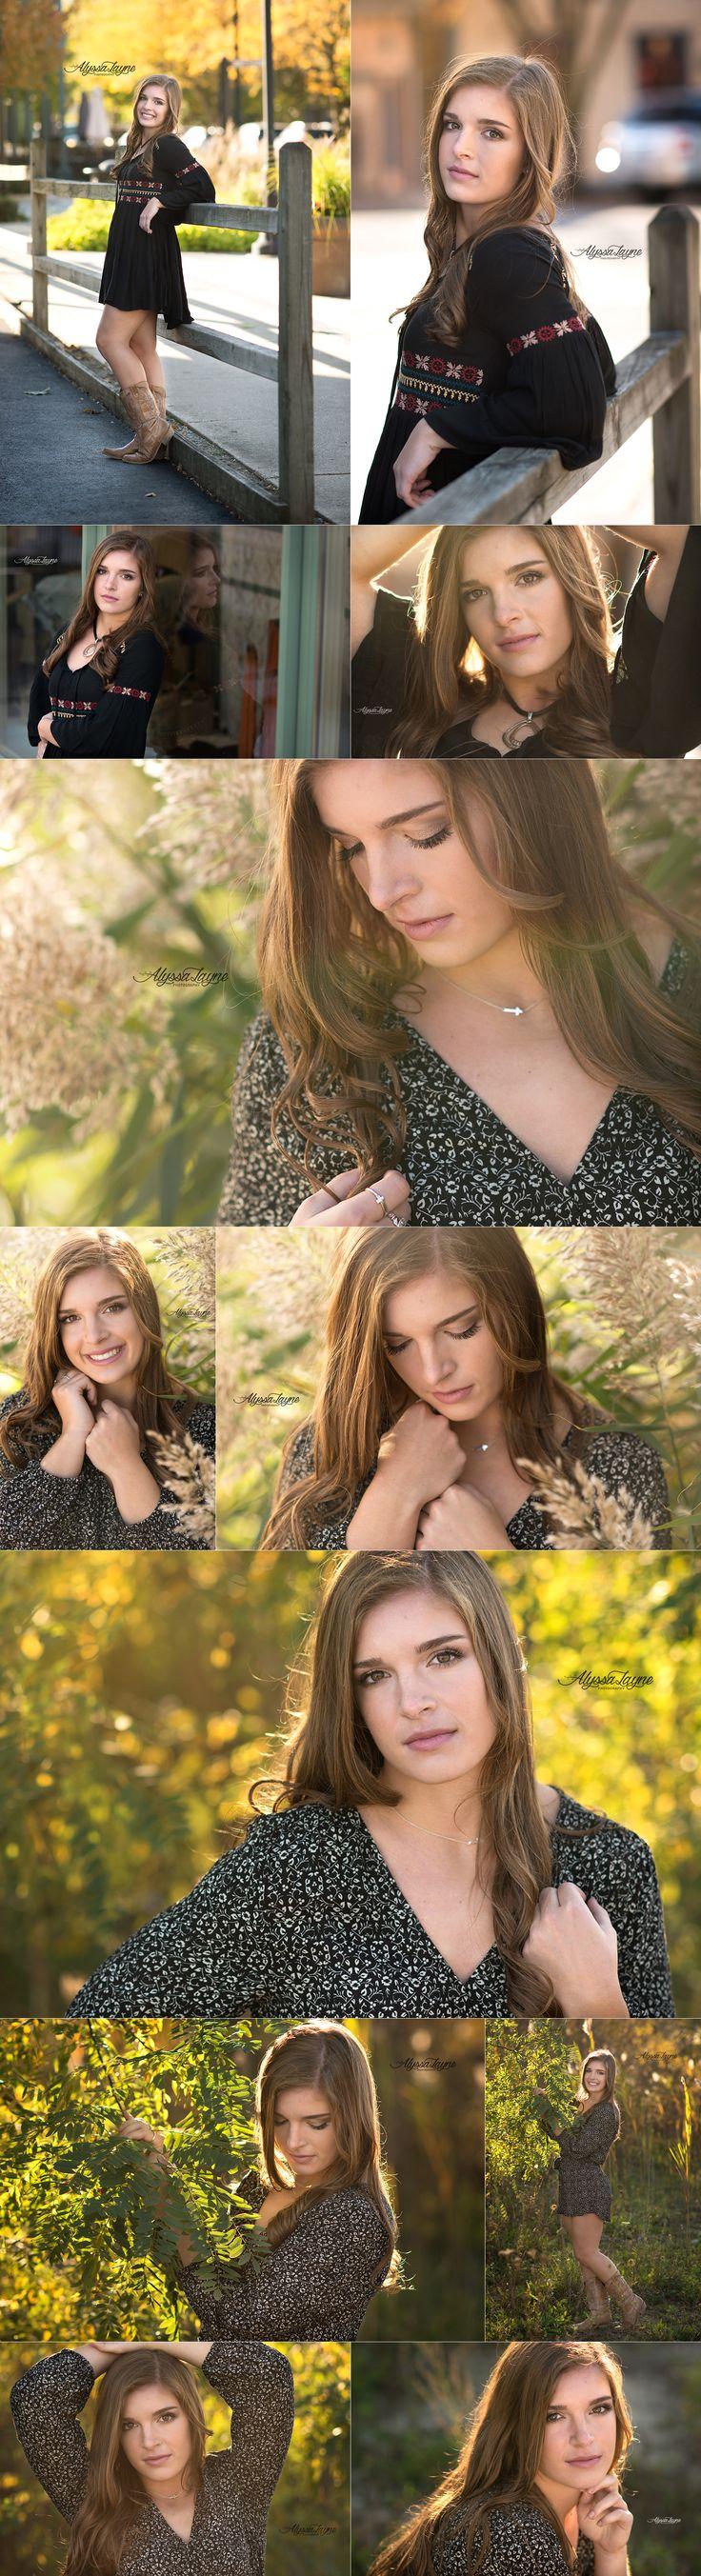 Alyssa Layne Photography | Paige | Senior Poses | Illinois Senior Photographer